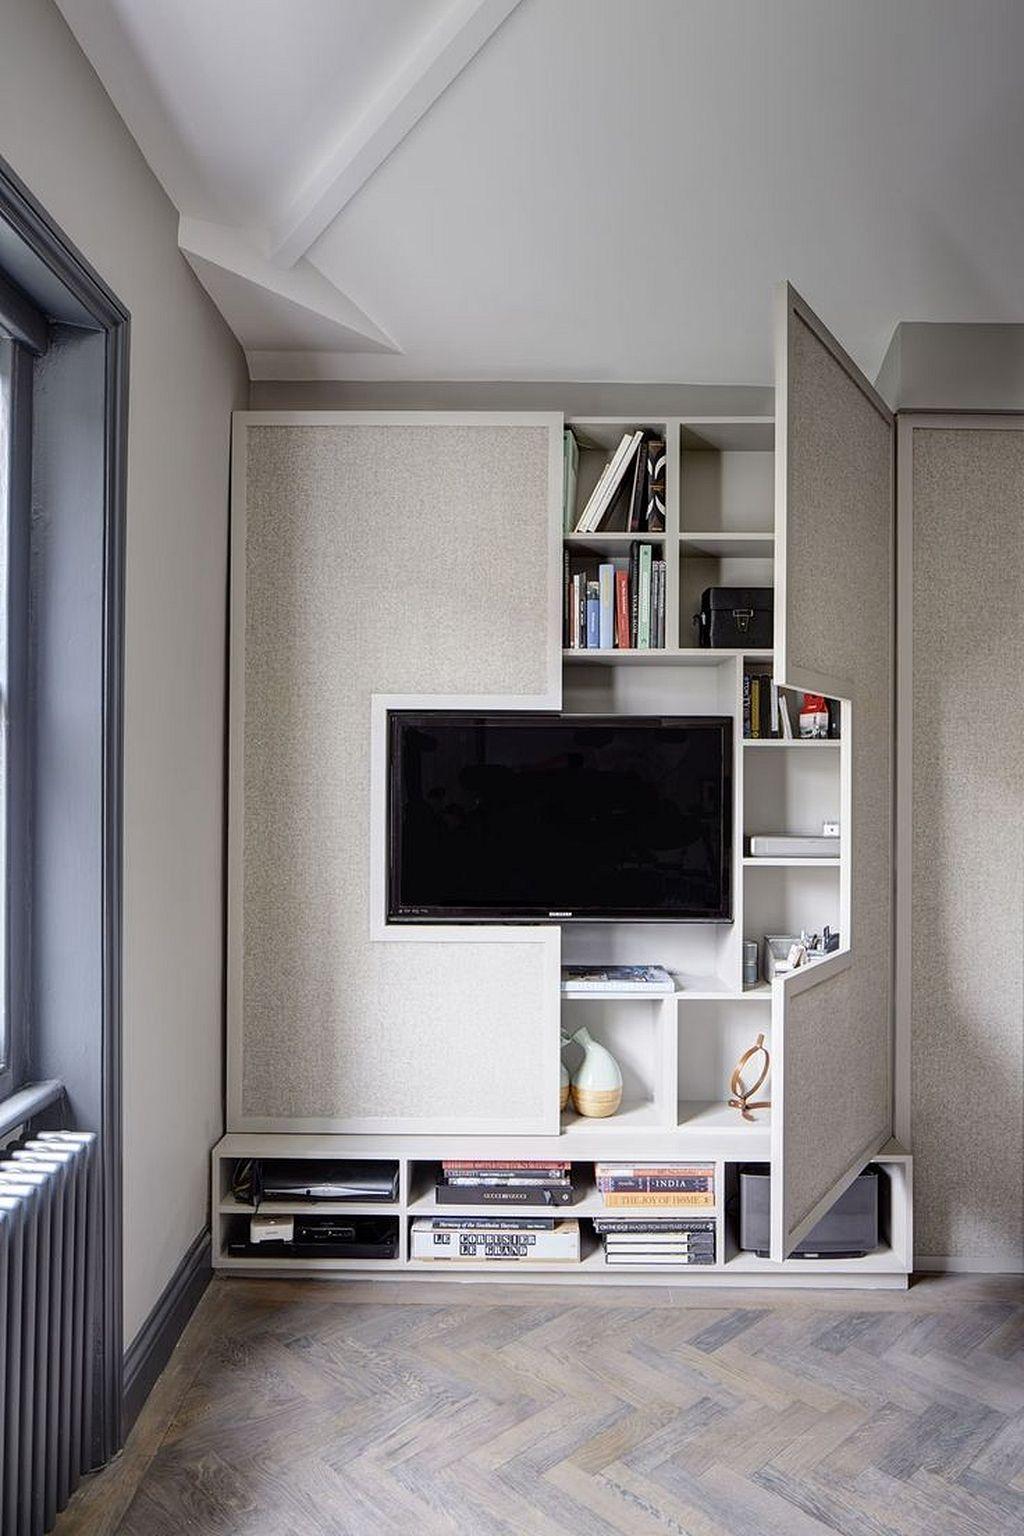 50 Apartment Decoration Ideas On A Budget Interior Home